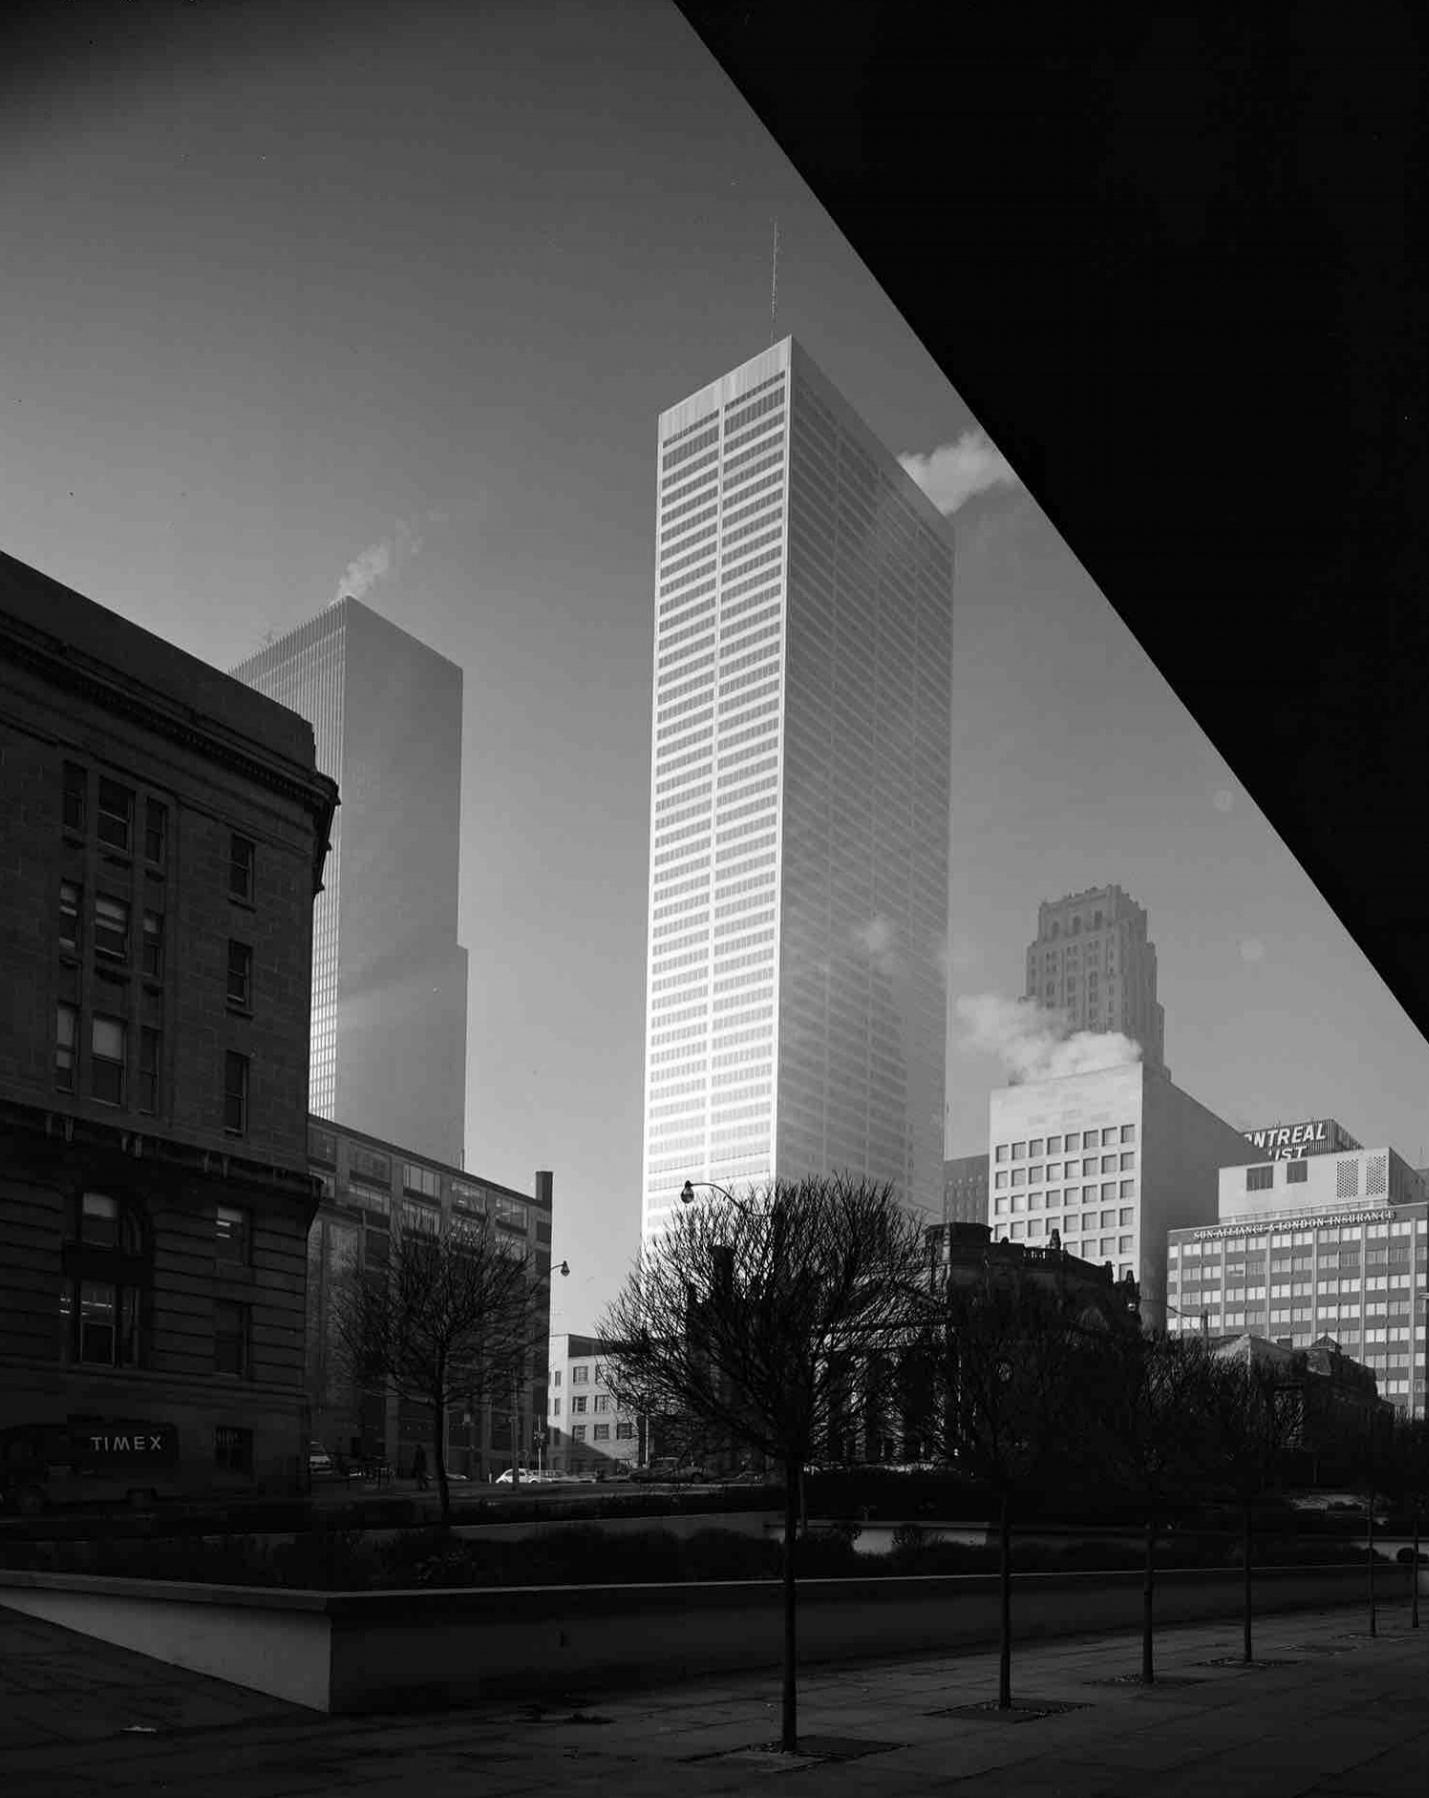 Mies_Chicago_45bn1833_hdr26 copy.jpg